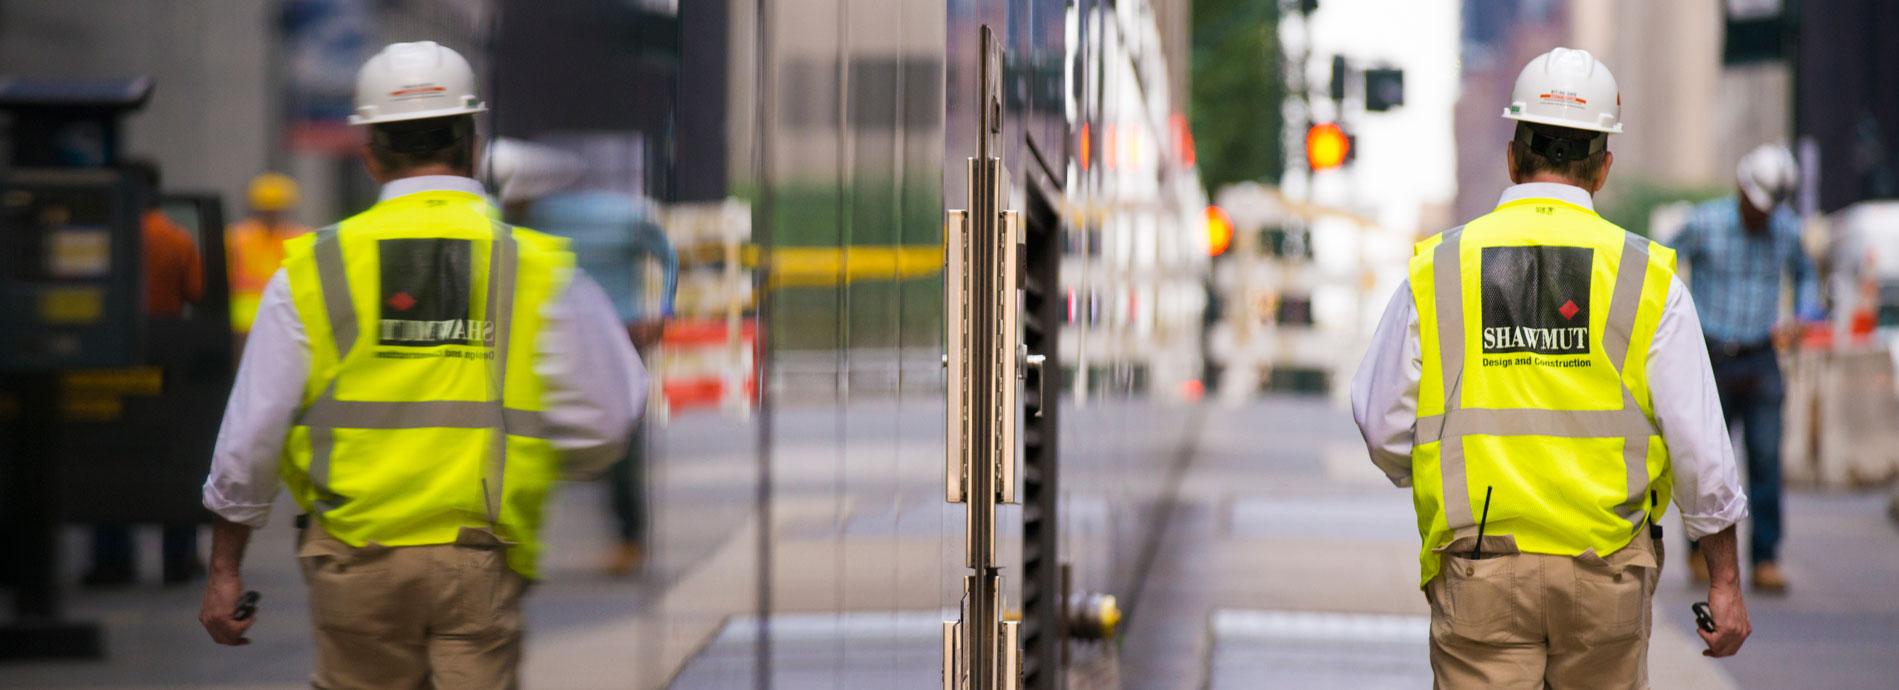 about shawmut construction management company